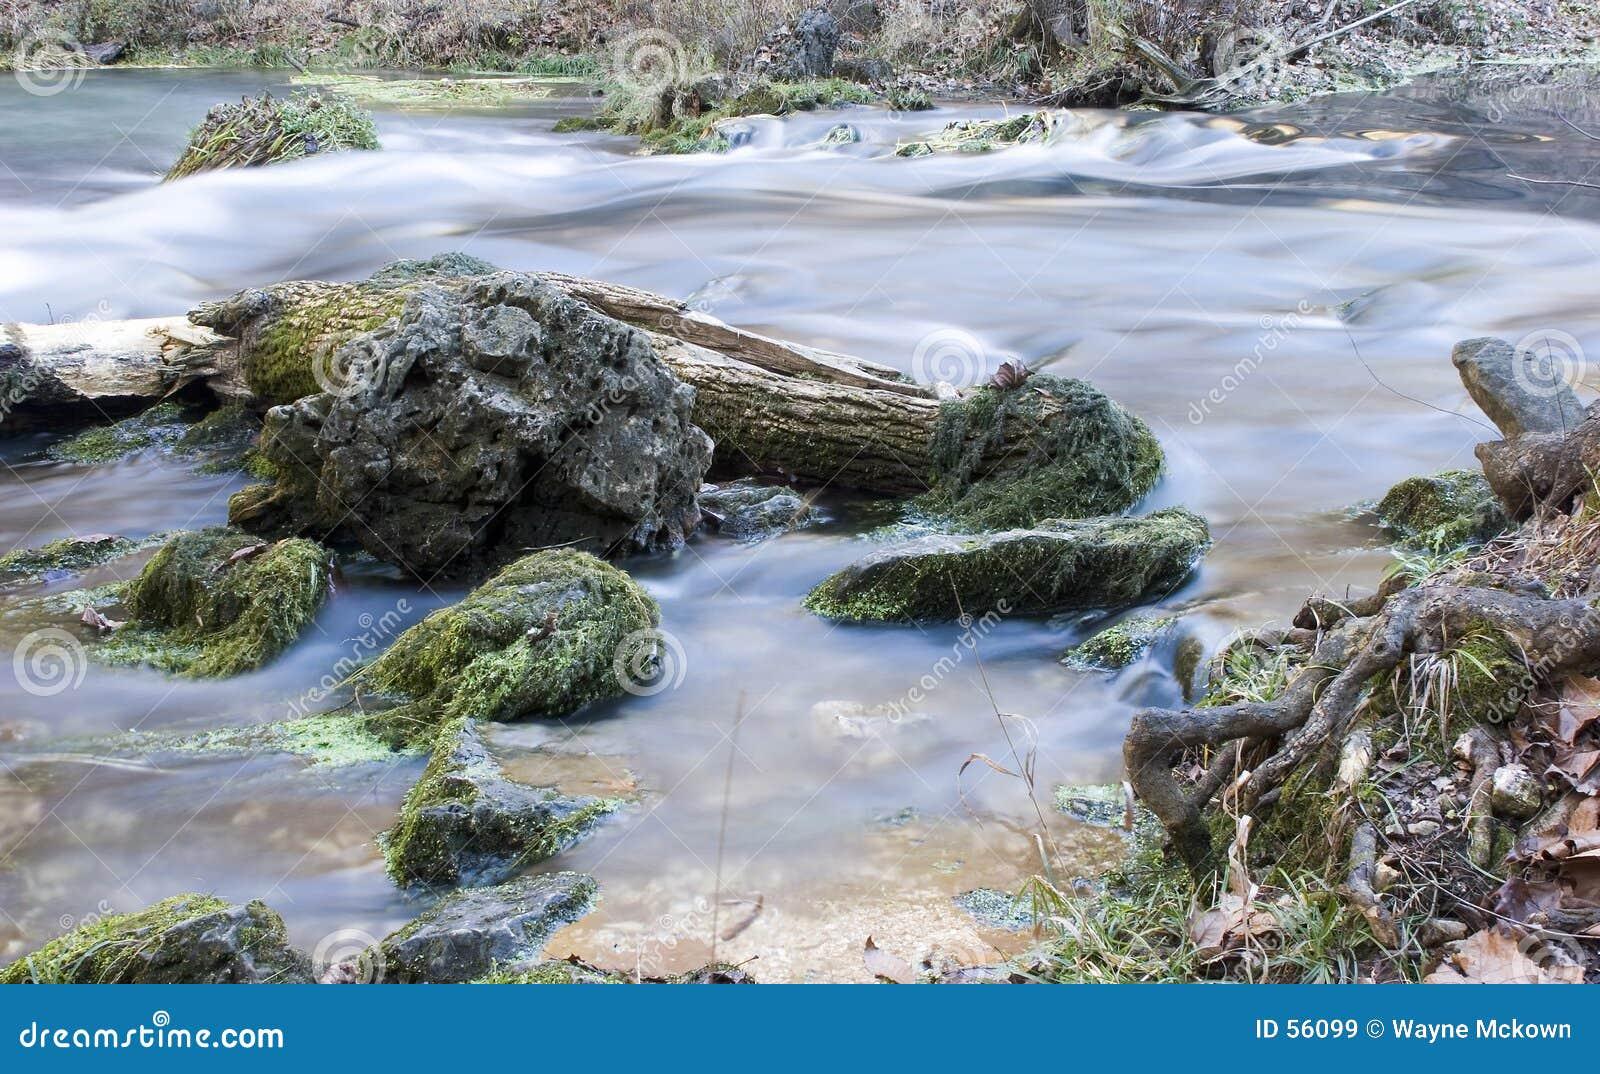 flowing Water, stream